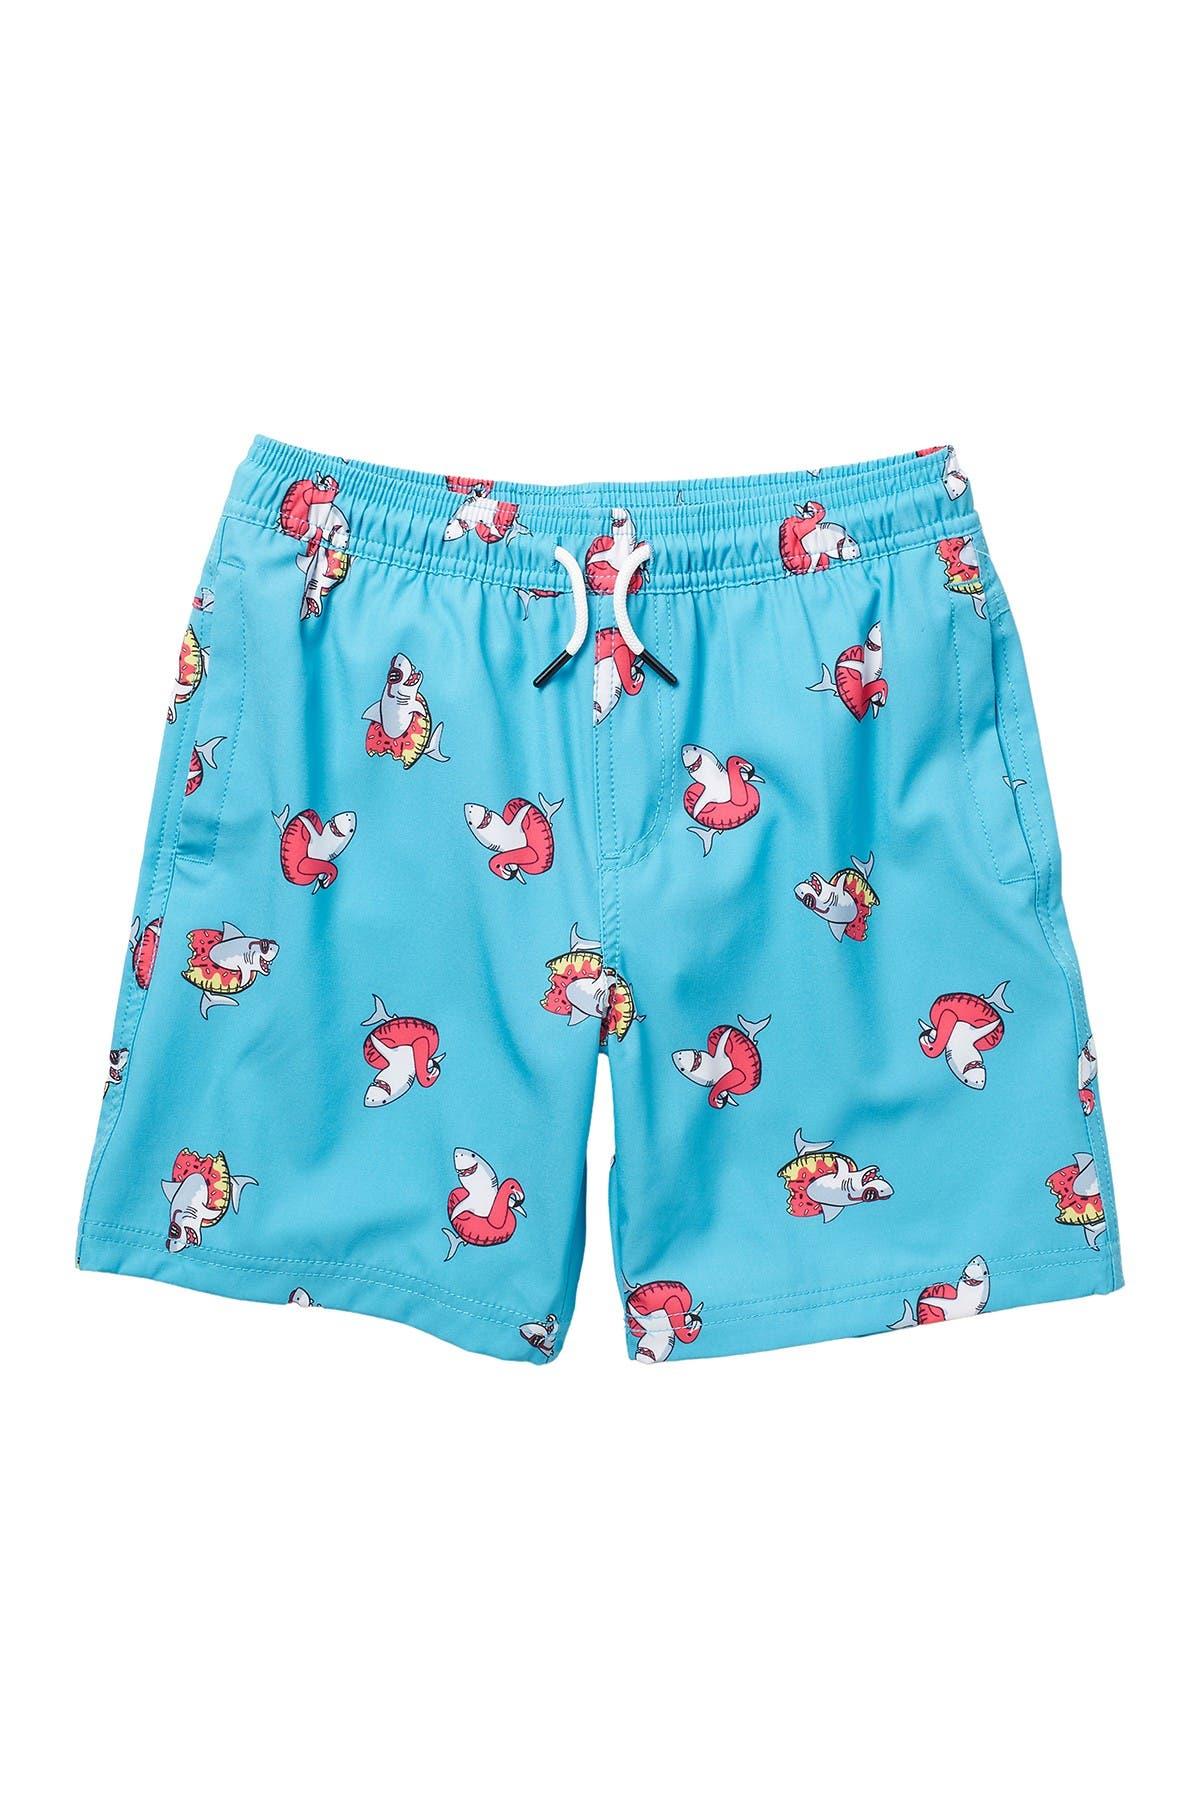 Image of Sovereign Code Kai Printed Swim Shorts